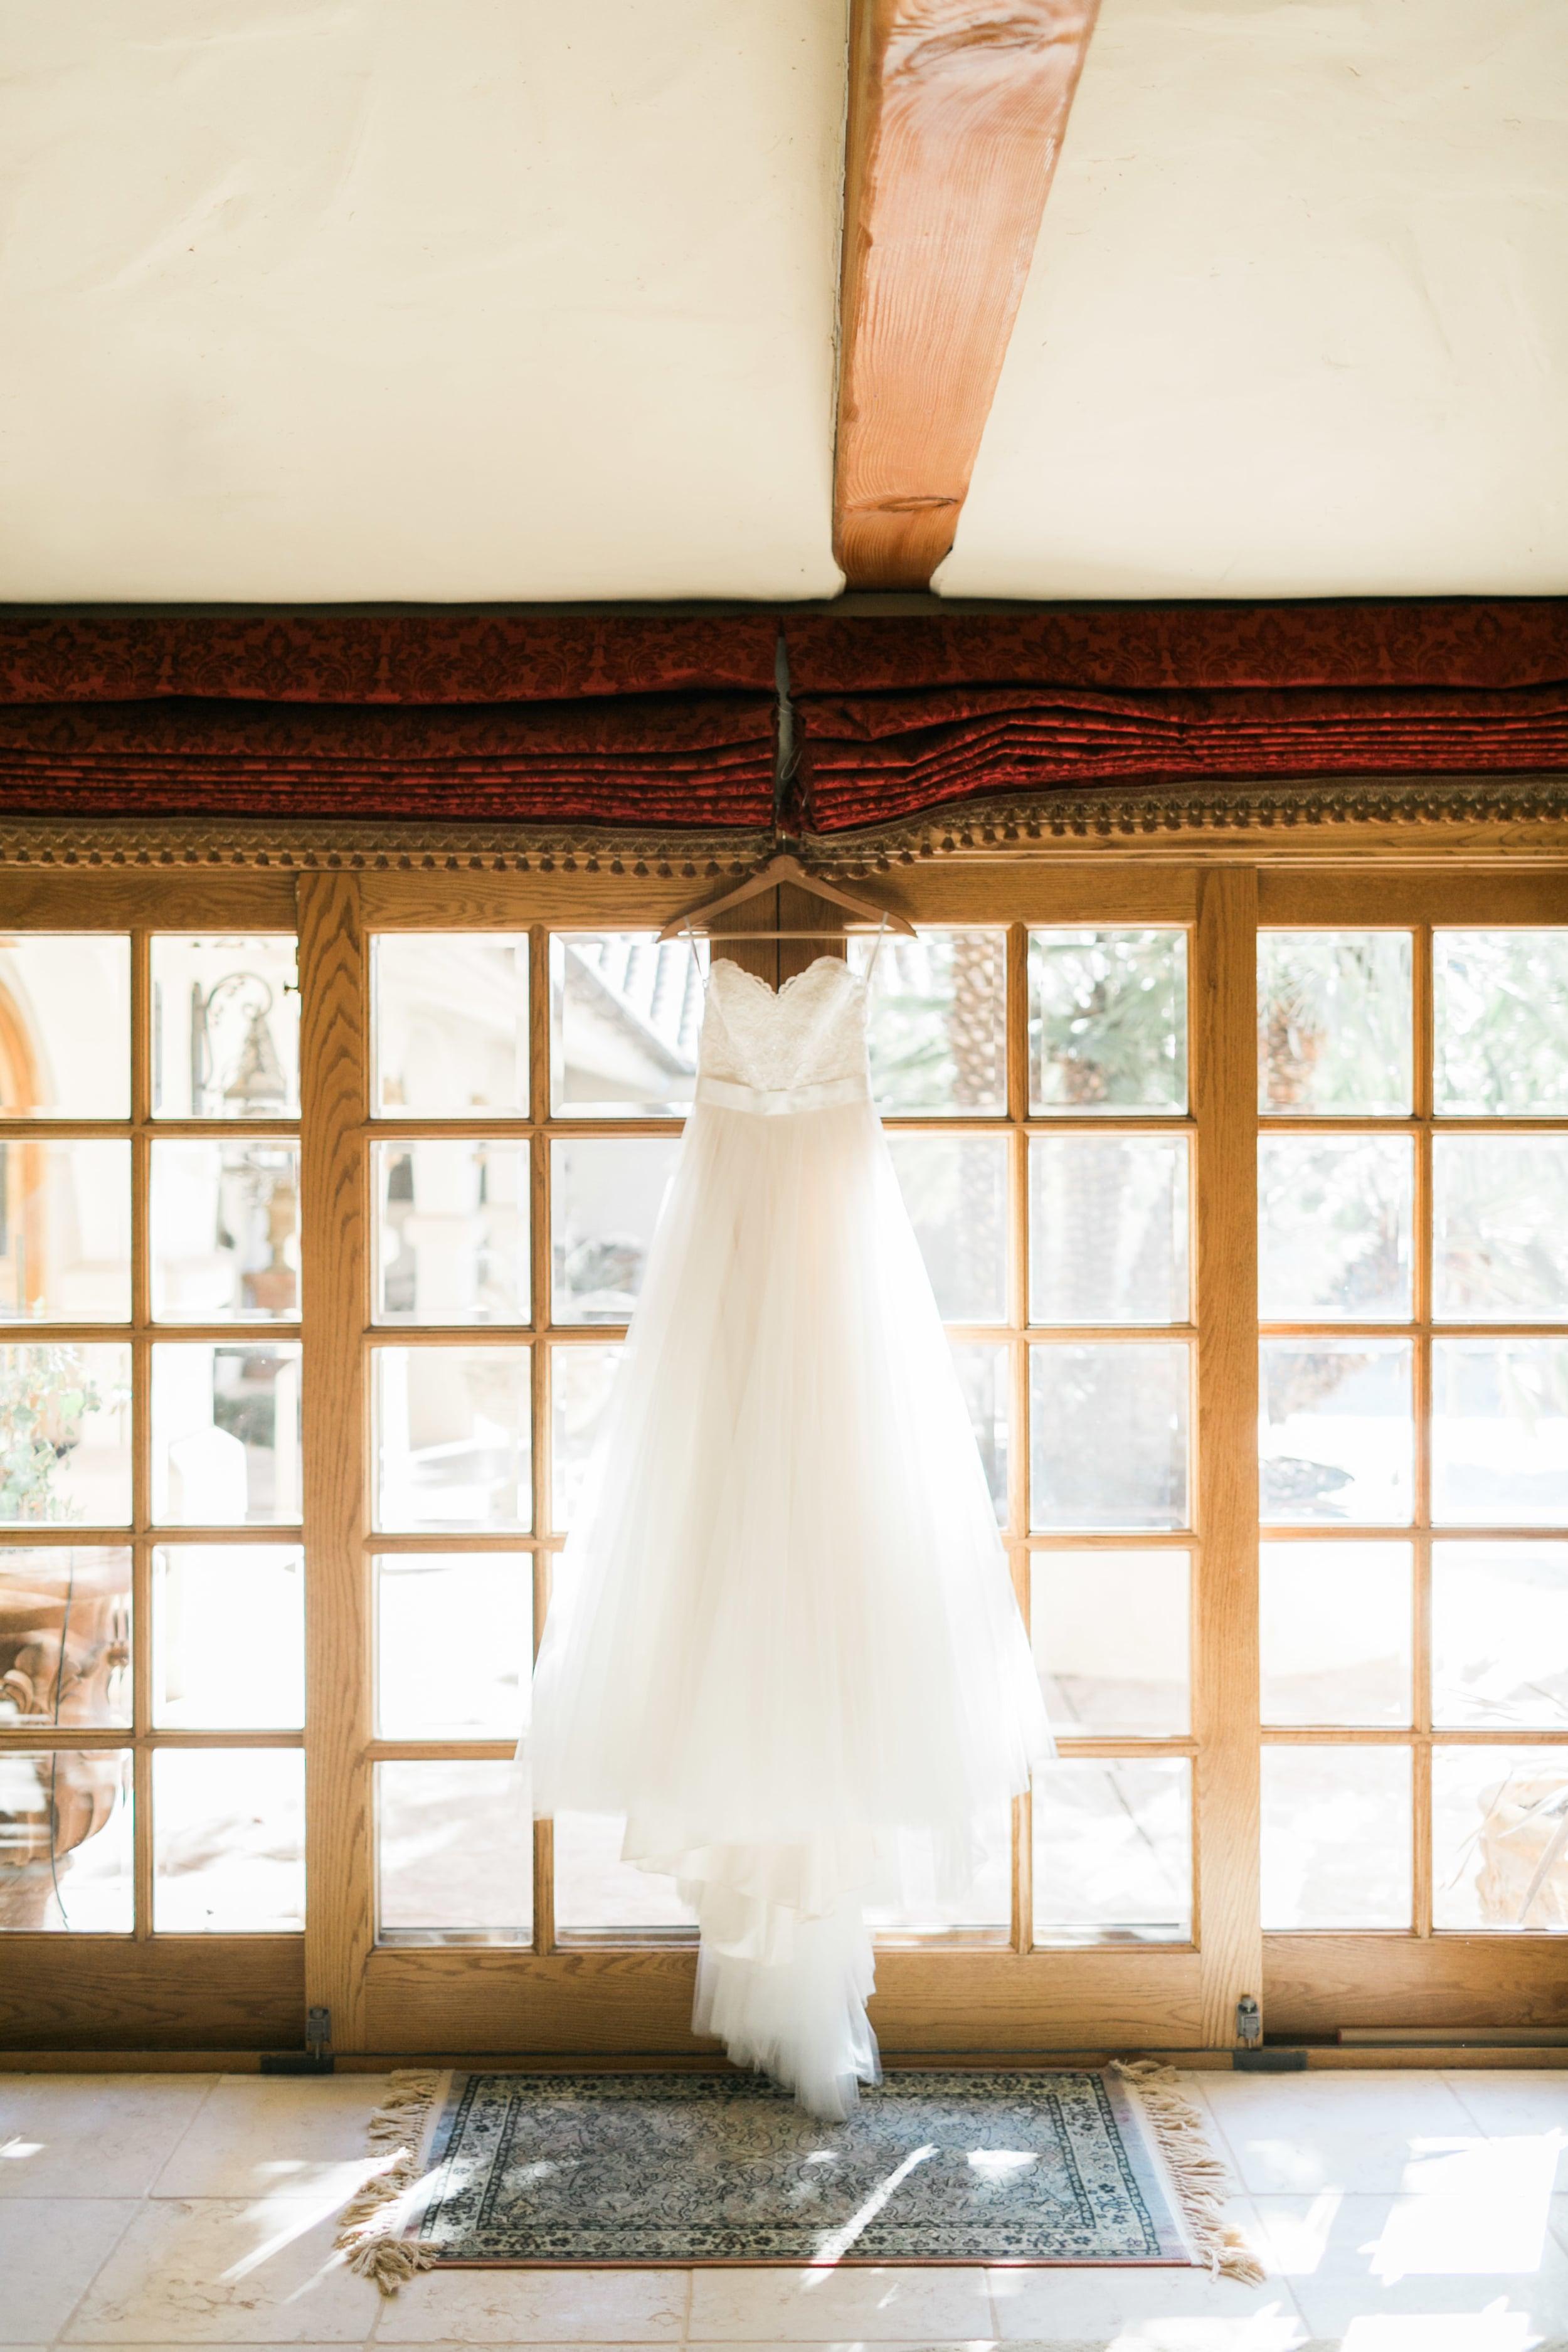 Natalie_Schutt_Photography_Winter_Wedding_San_Luis_Obispo-24.jpg